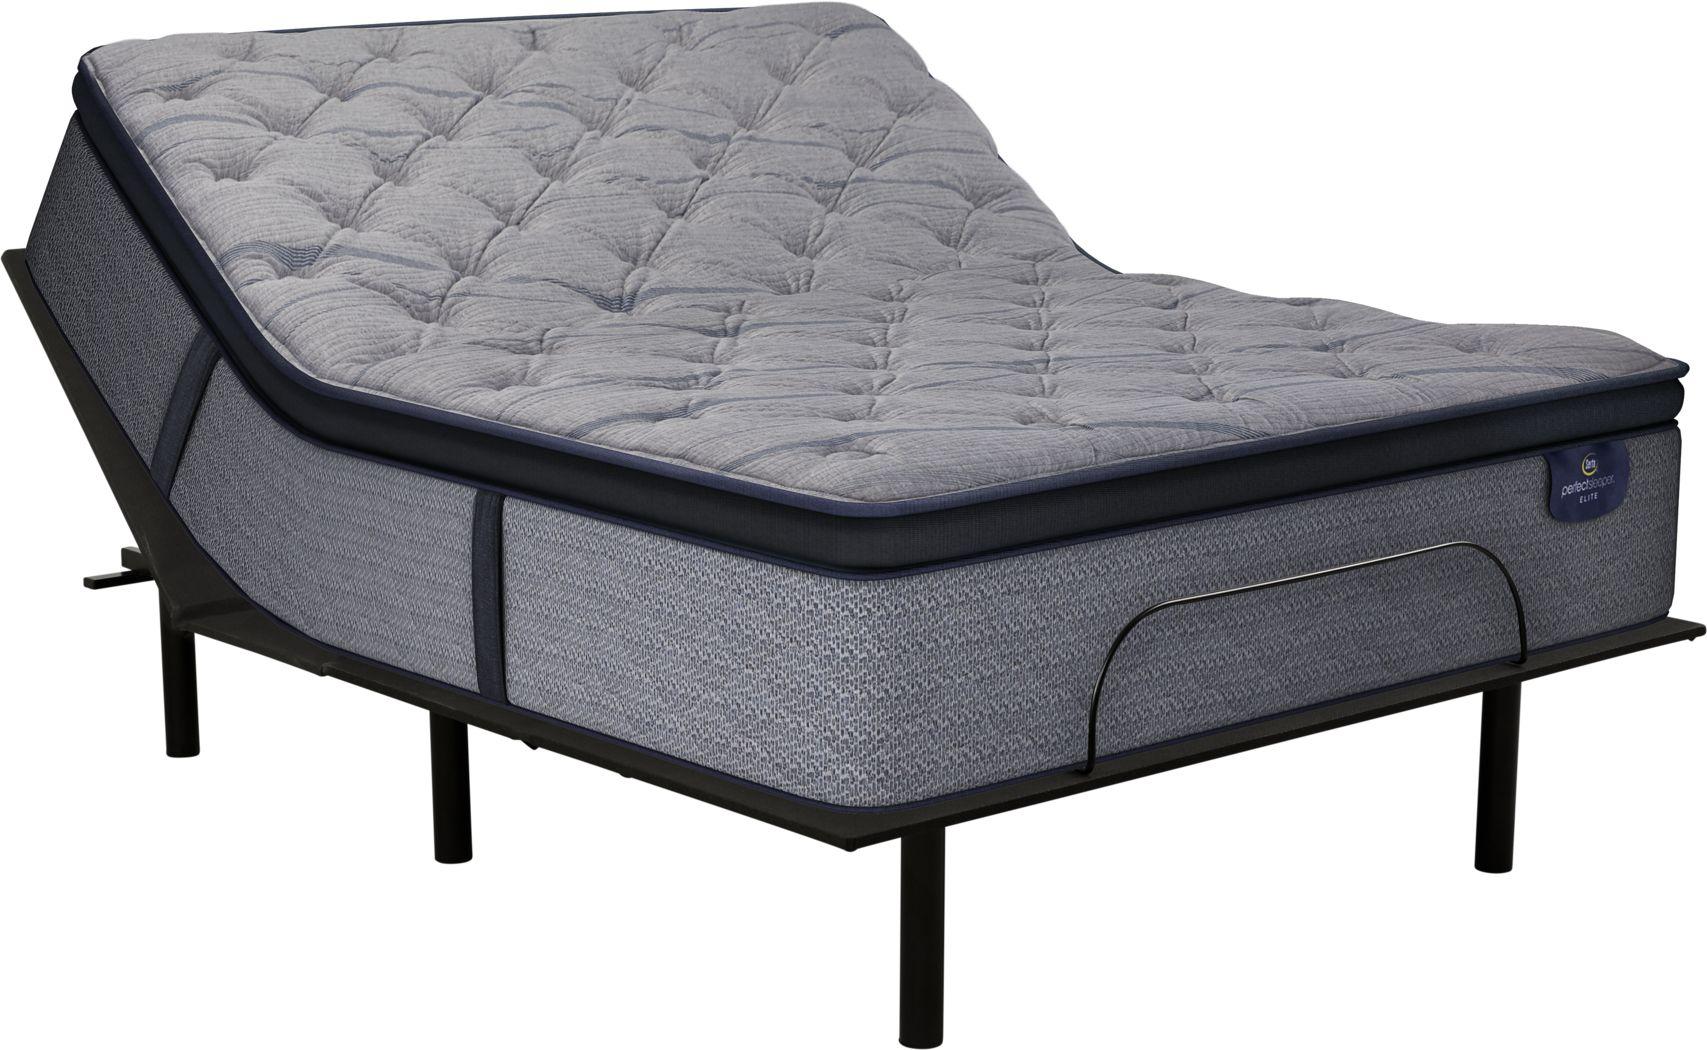 Serta Perfect Sleeper Vernon Hills Queen Mattress with RTG Sleep 2000 Adjustable Base